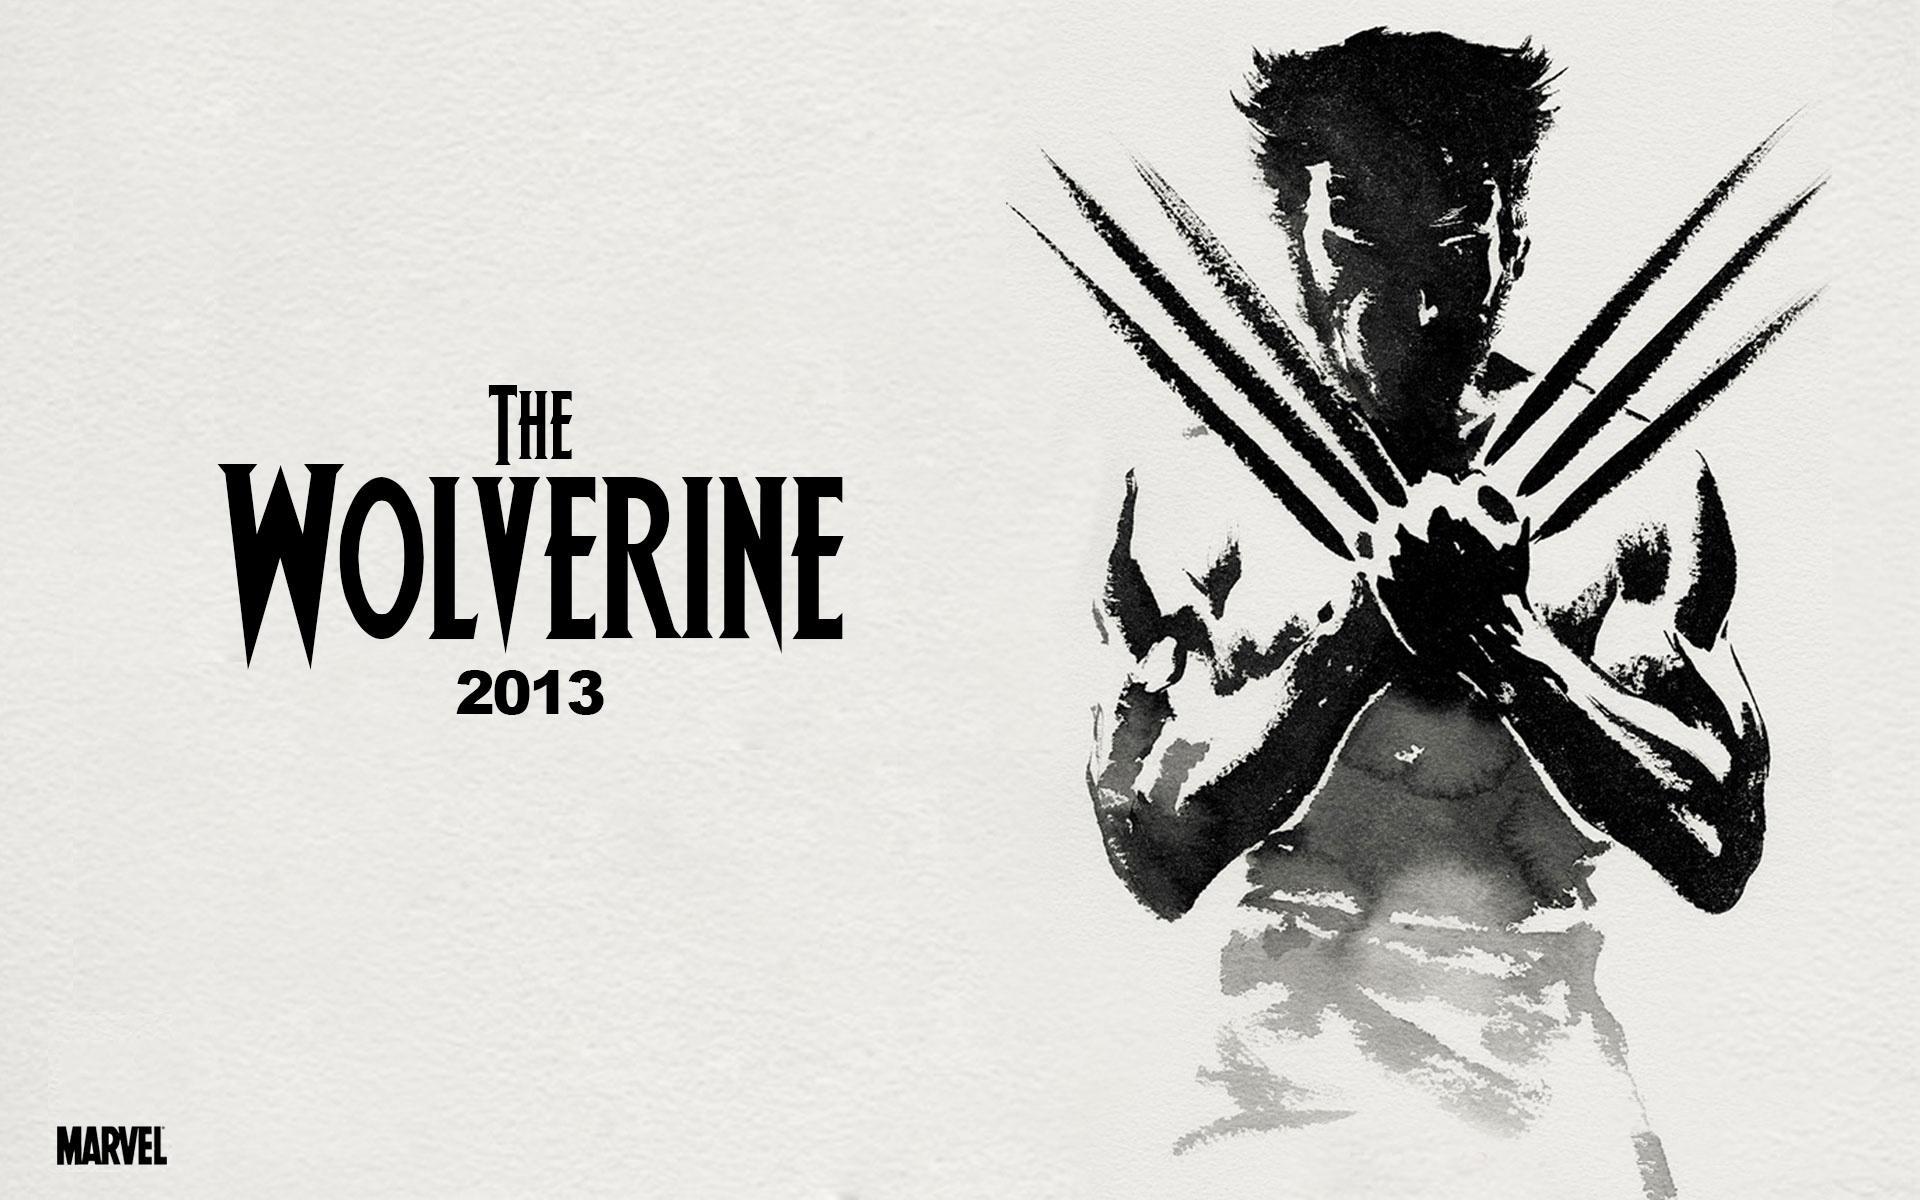 Wolverine Movies Comics Video Games Superhero HD 1080p